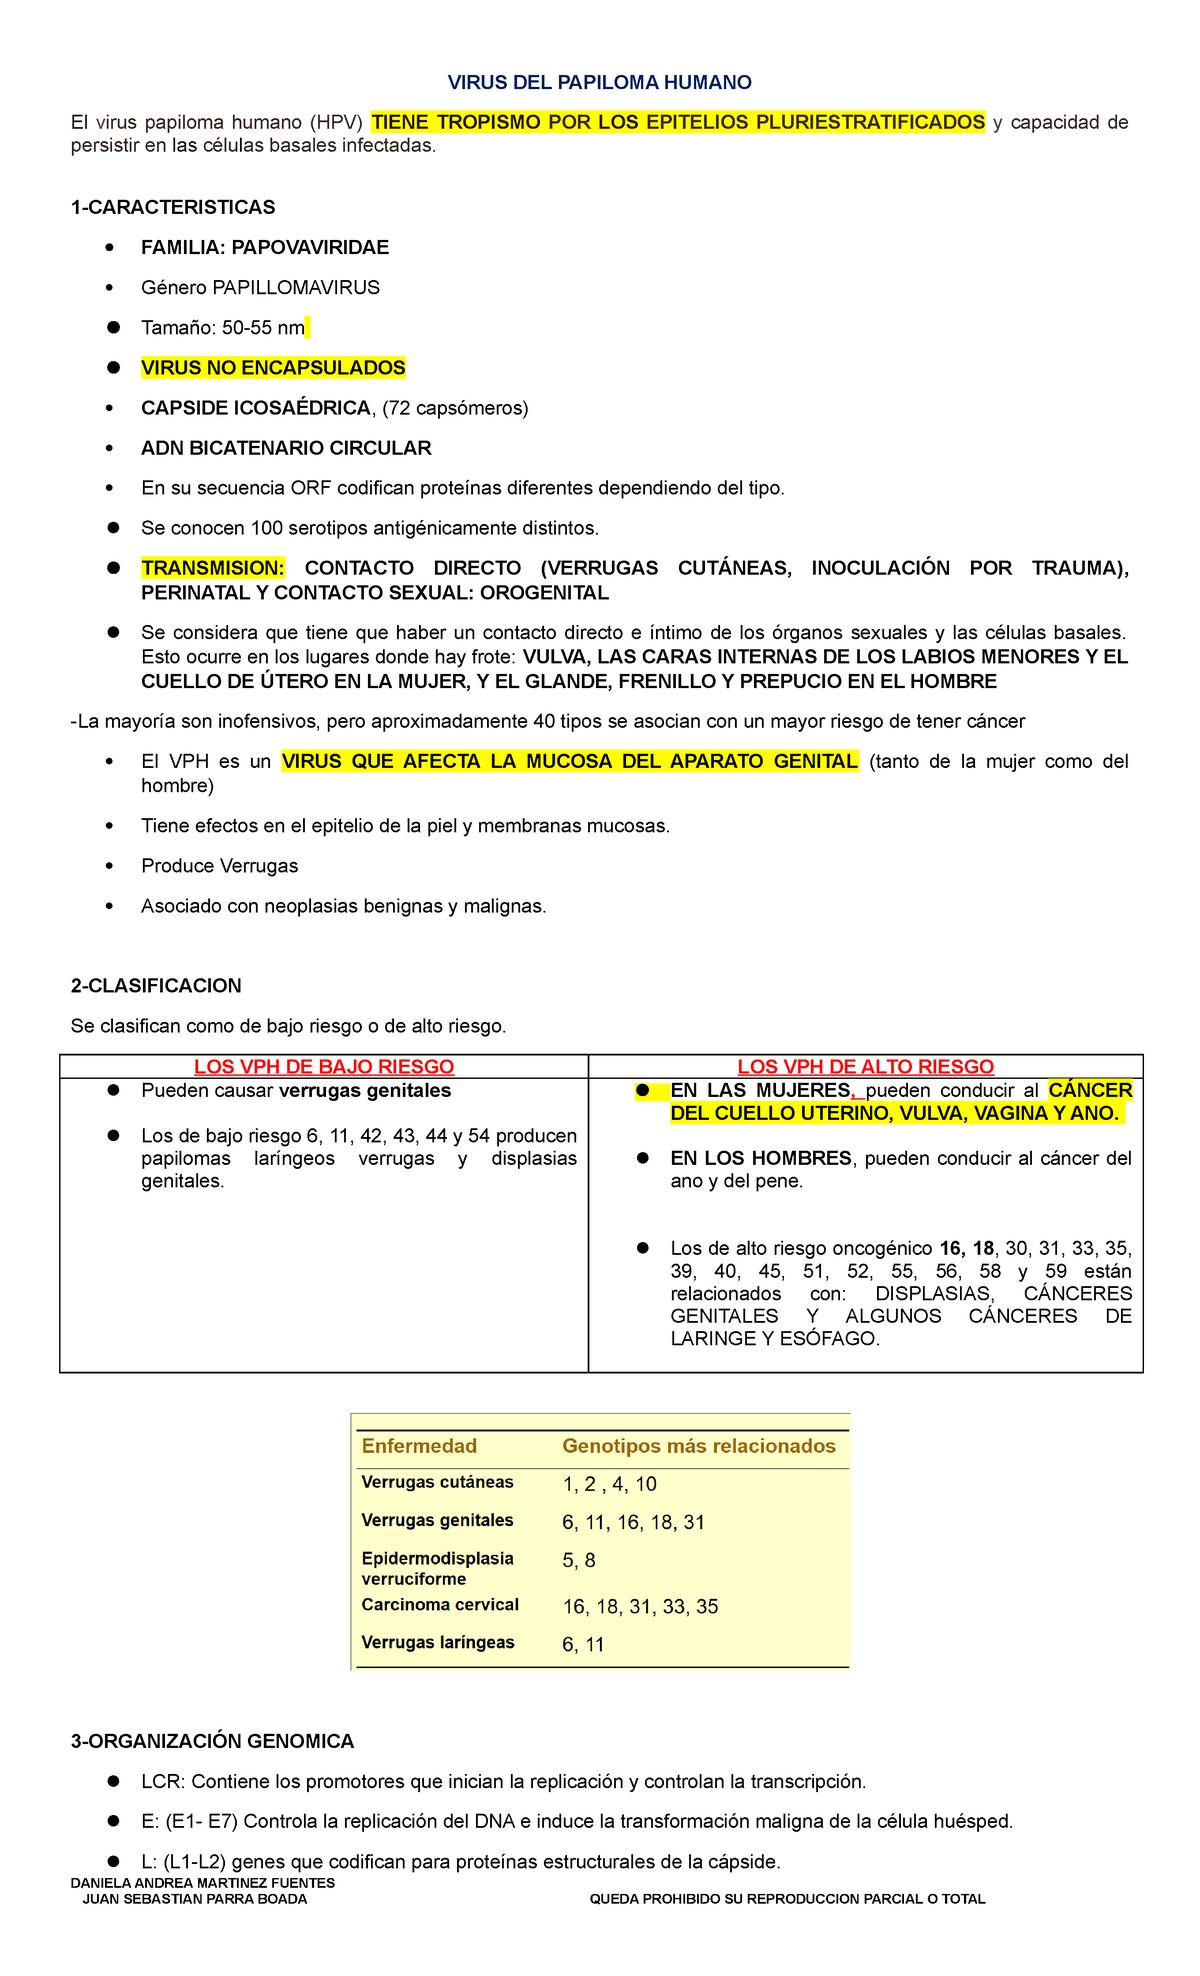 papiloma humano caracteristicas de la enfermedad ciuperci yurta